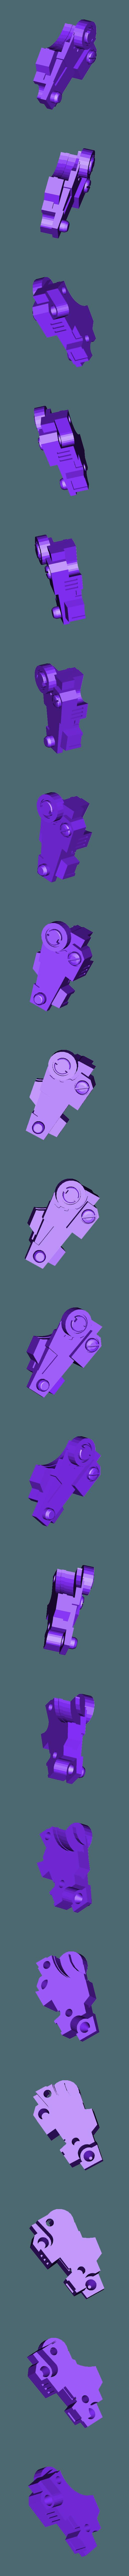 13Storm_Surge_Shin_BX2.obj Download free OBJ file Tempest Rush Mech • 3D printer model, Leesedrenfort